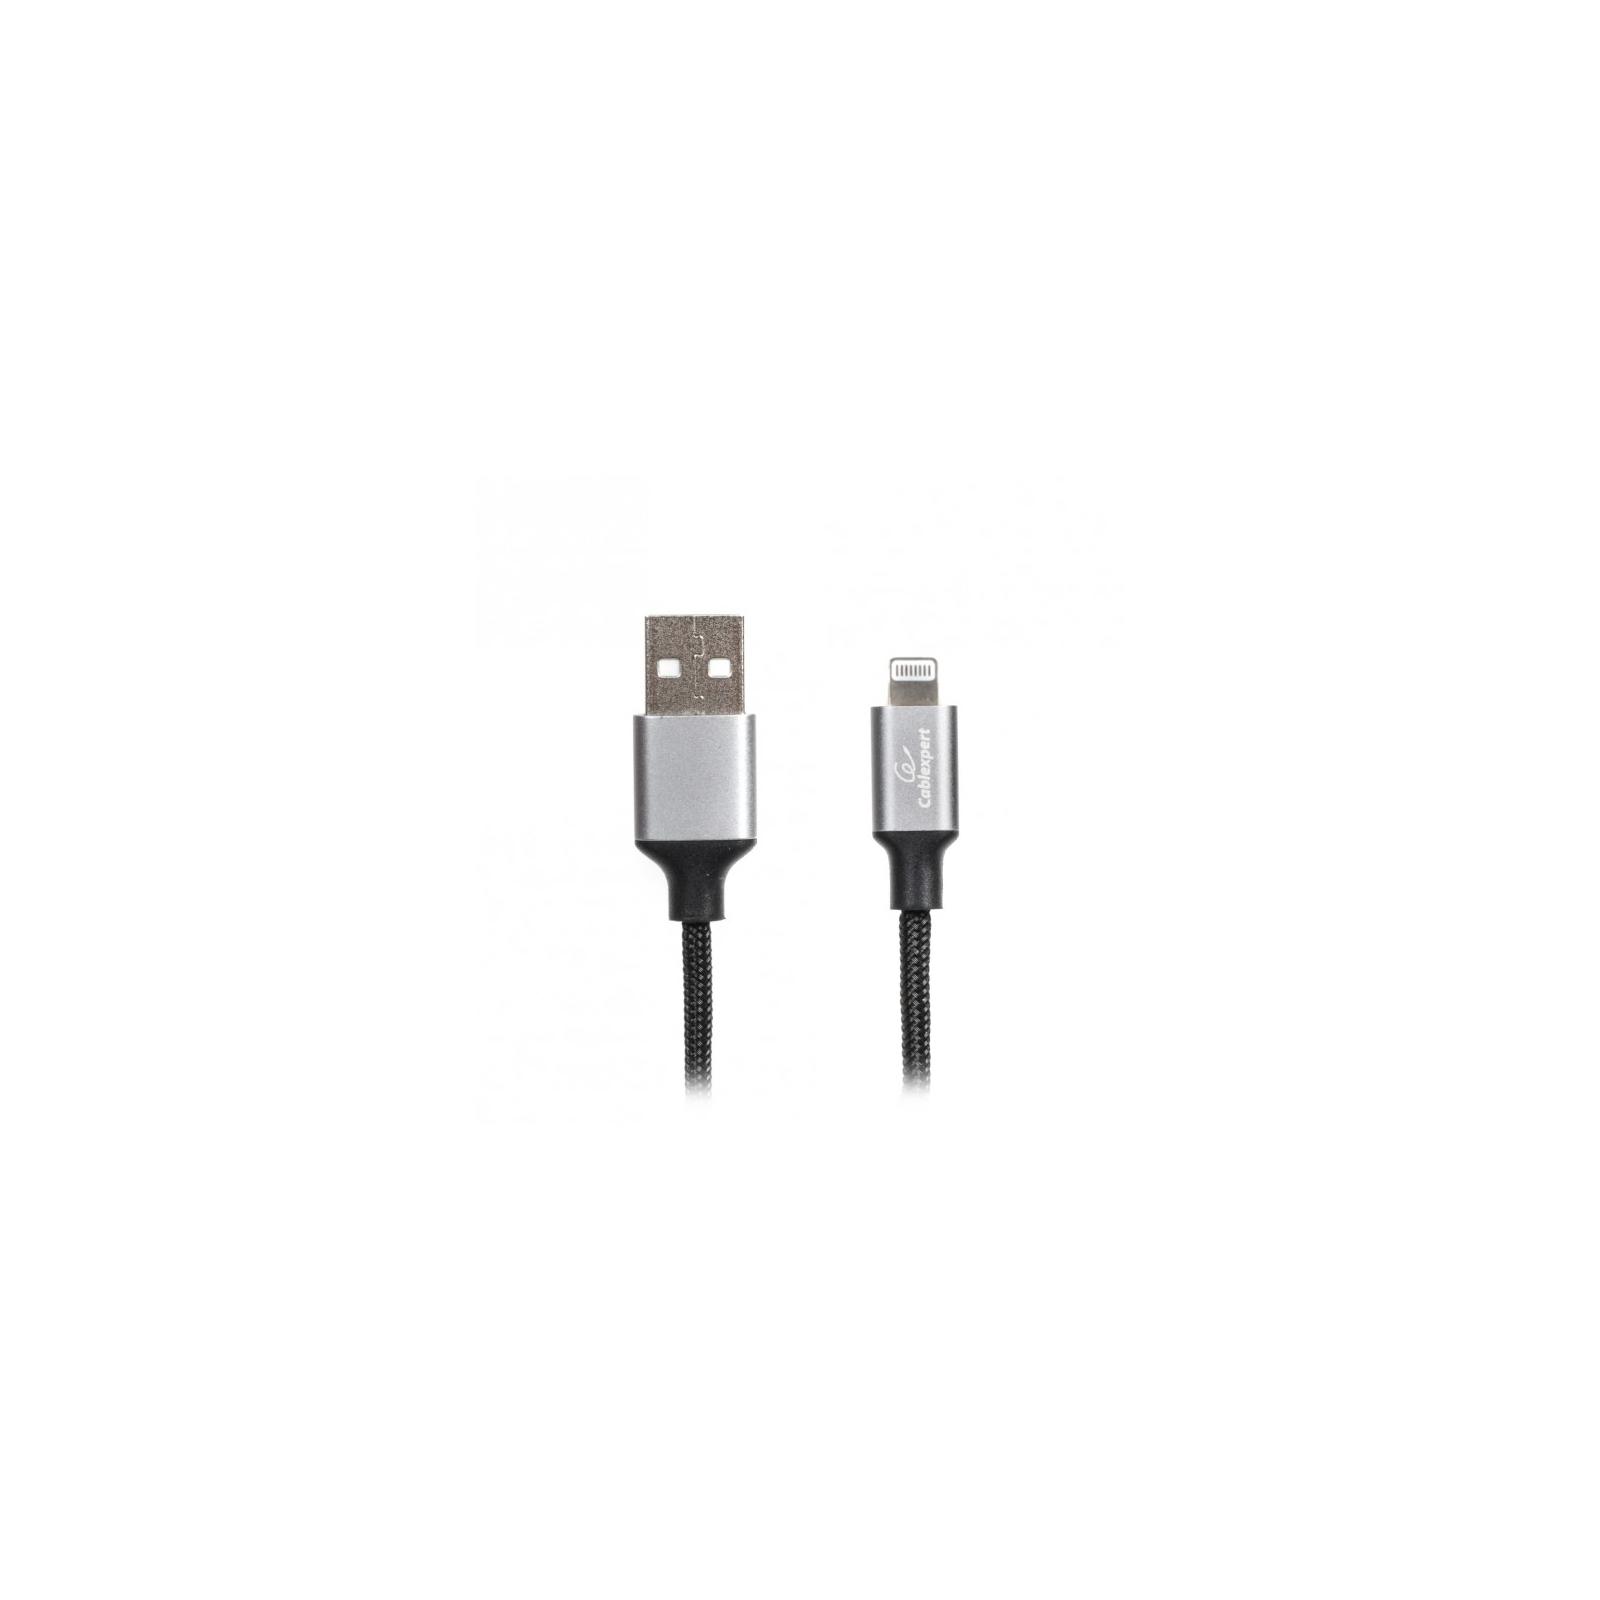 Дата кабель USB 2.0 AM to Lightning 1.0m Cablexpert (CCPB-L-USB-09BK)